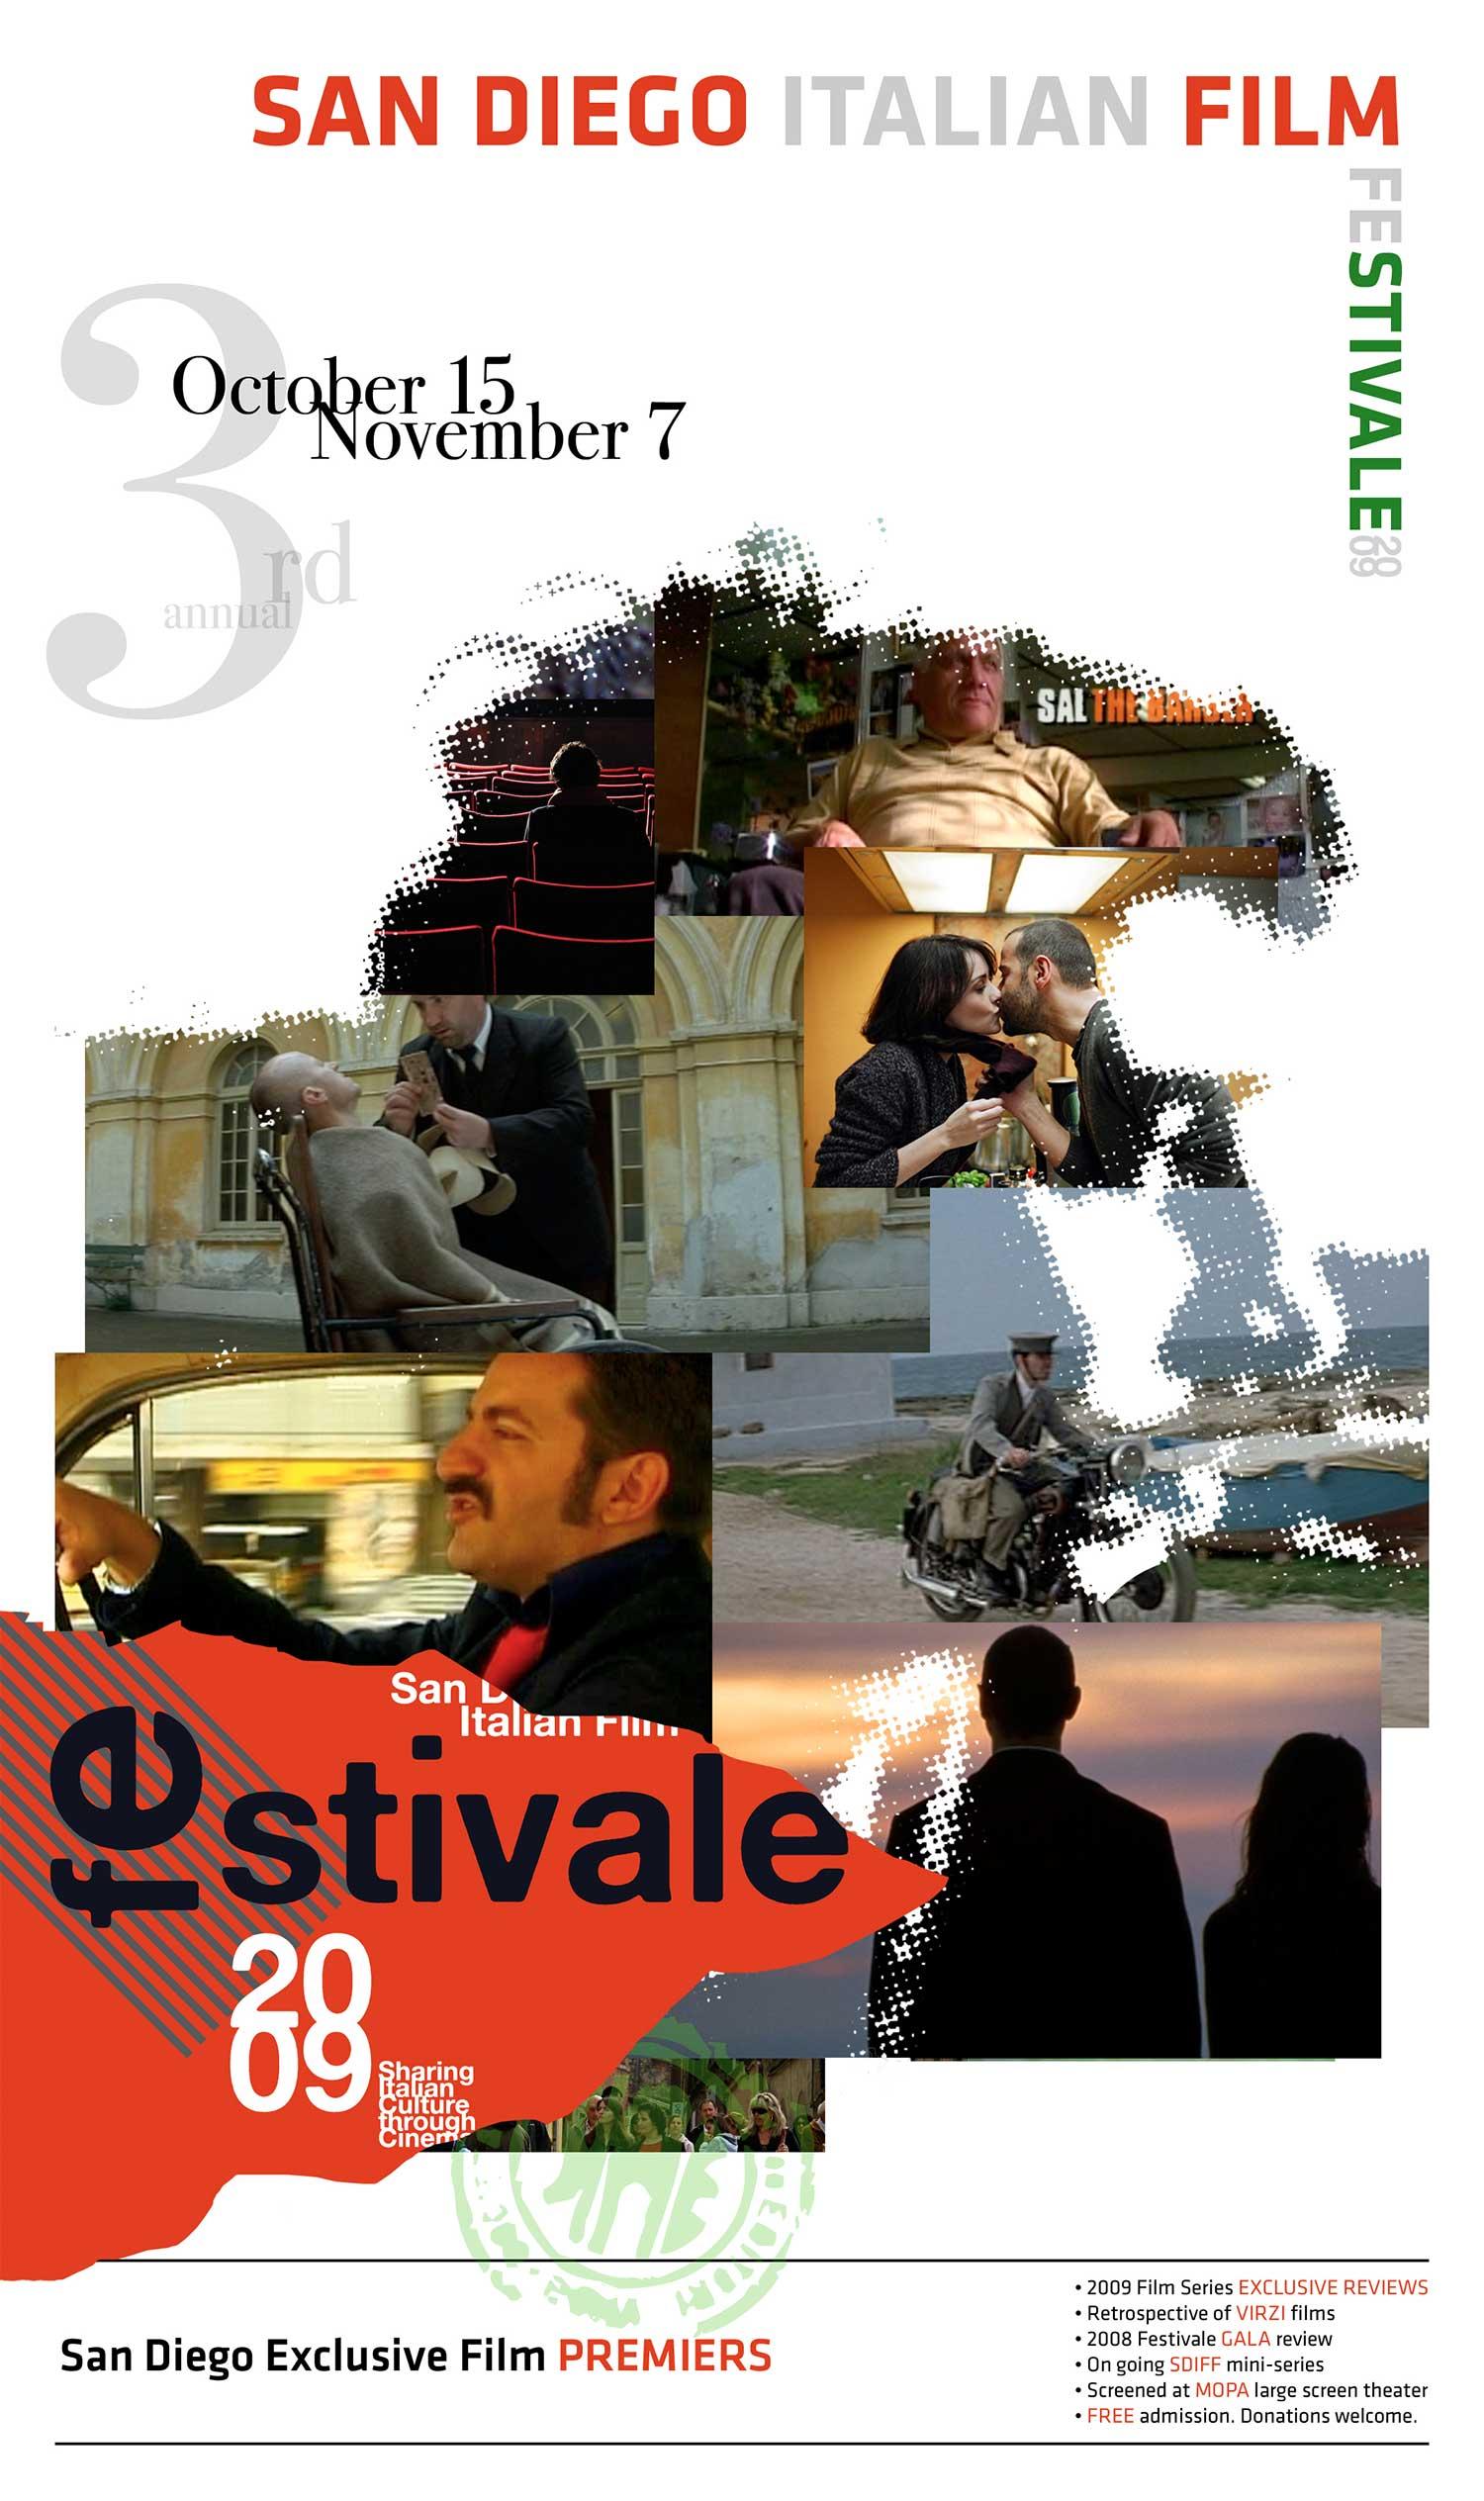 ron-miriello-grafico-san-diego-italian-film-festival-Miriello-branding-officina-07jpg